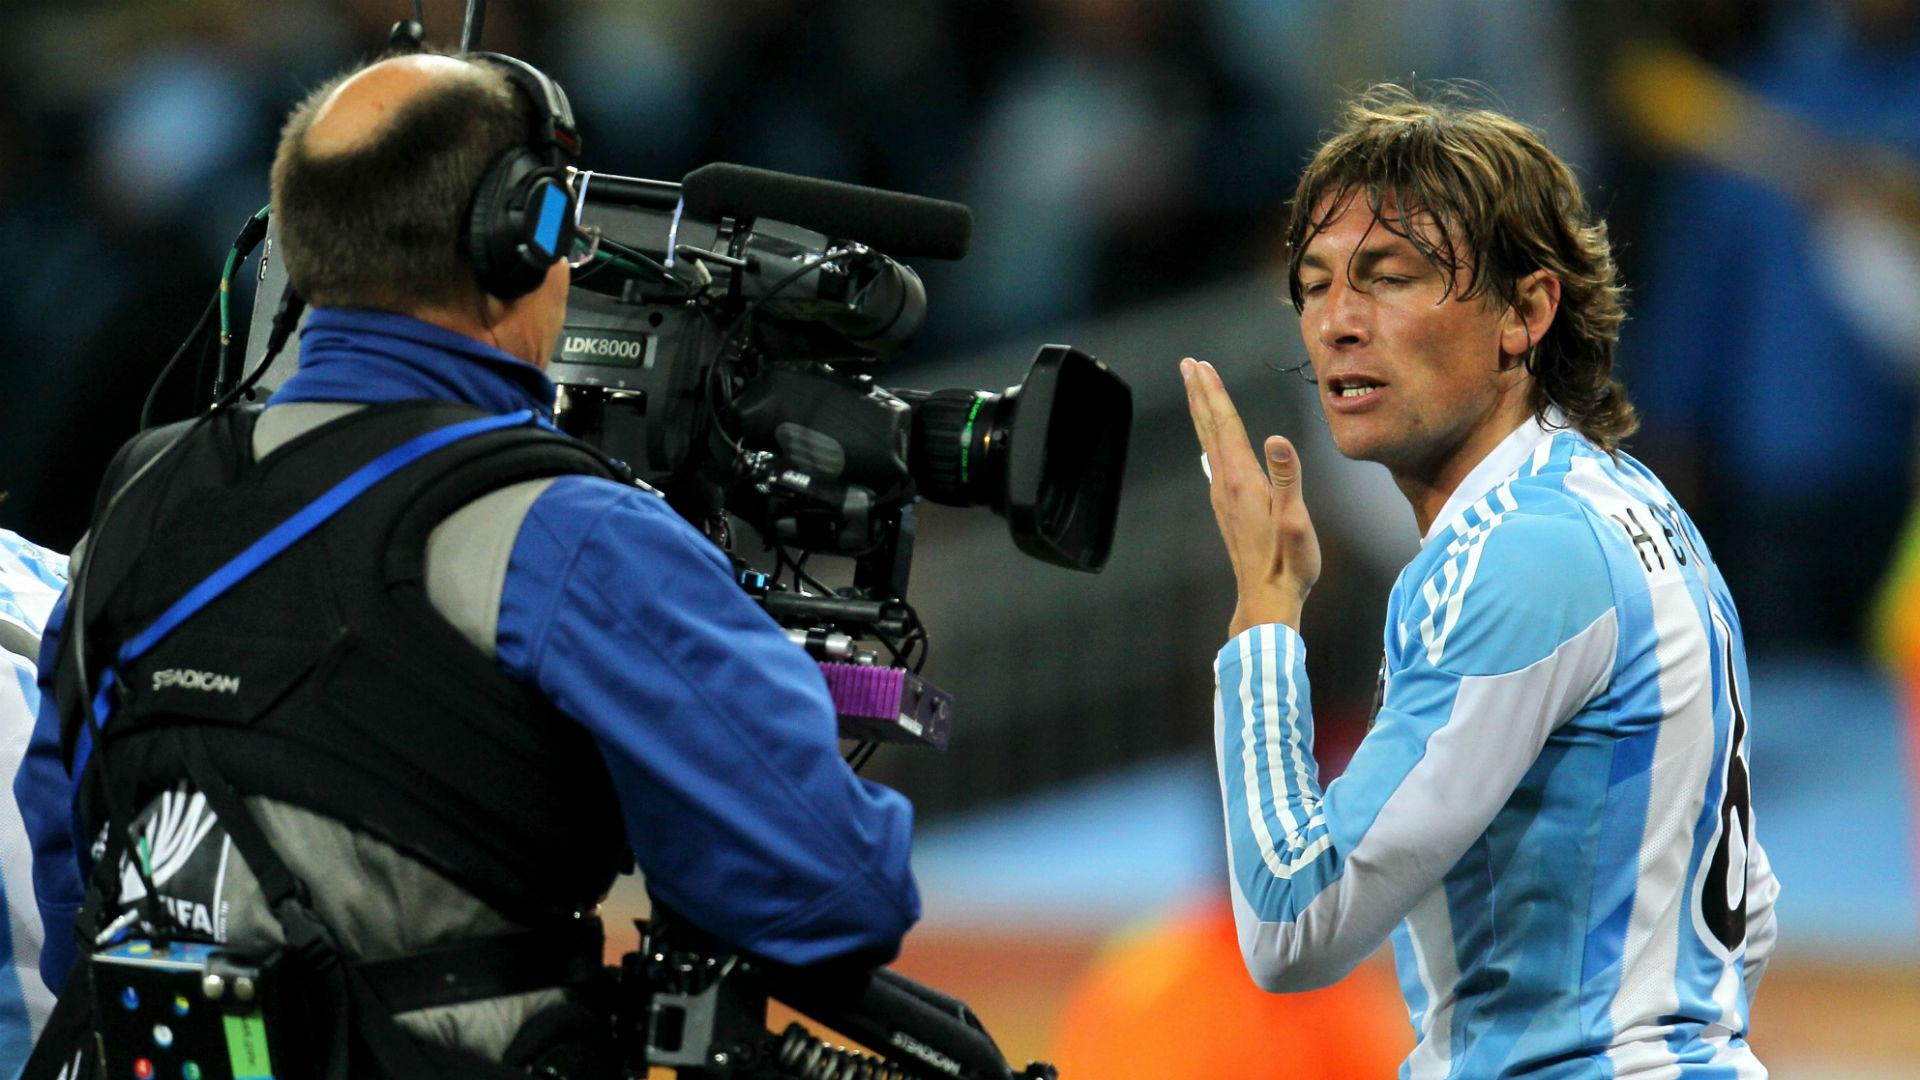 TV Cameras FIFA World Cup